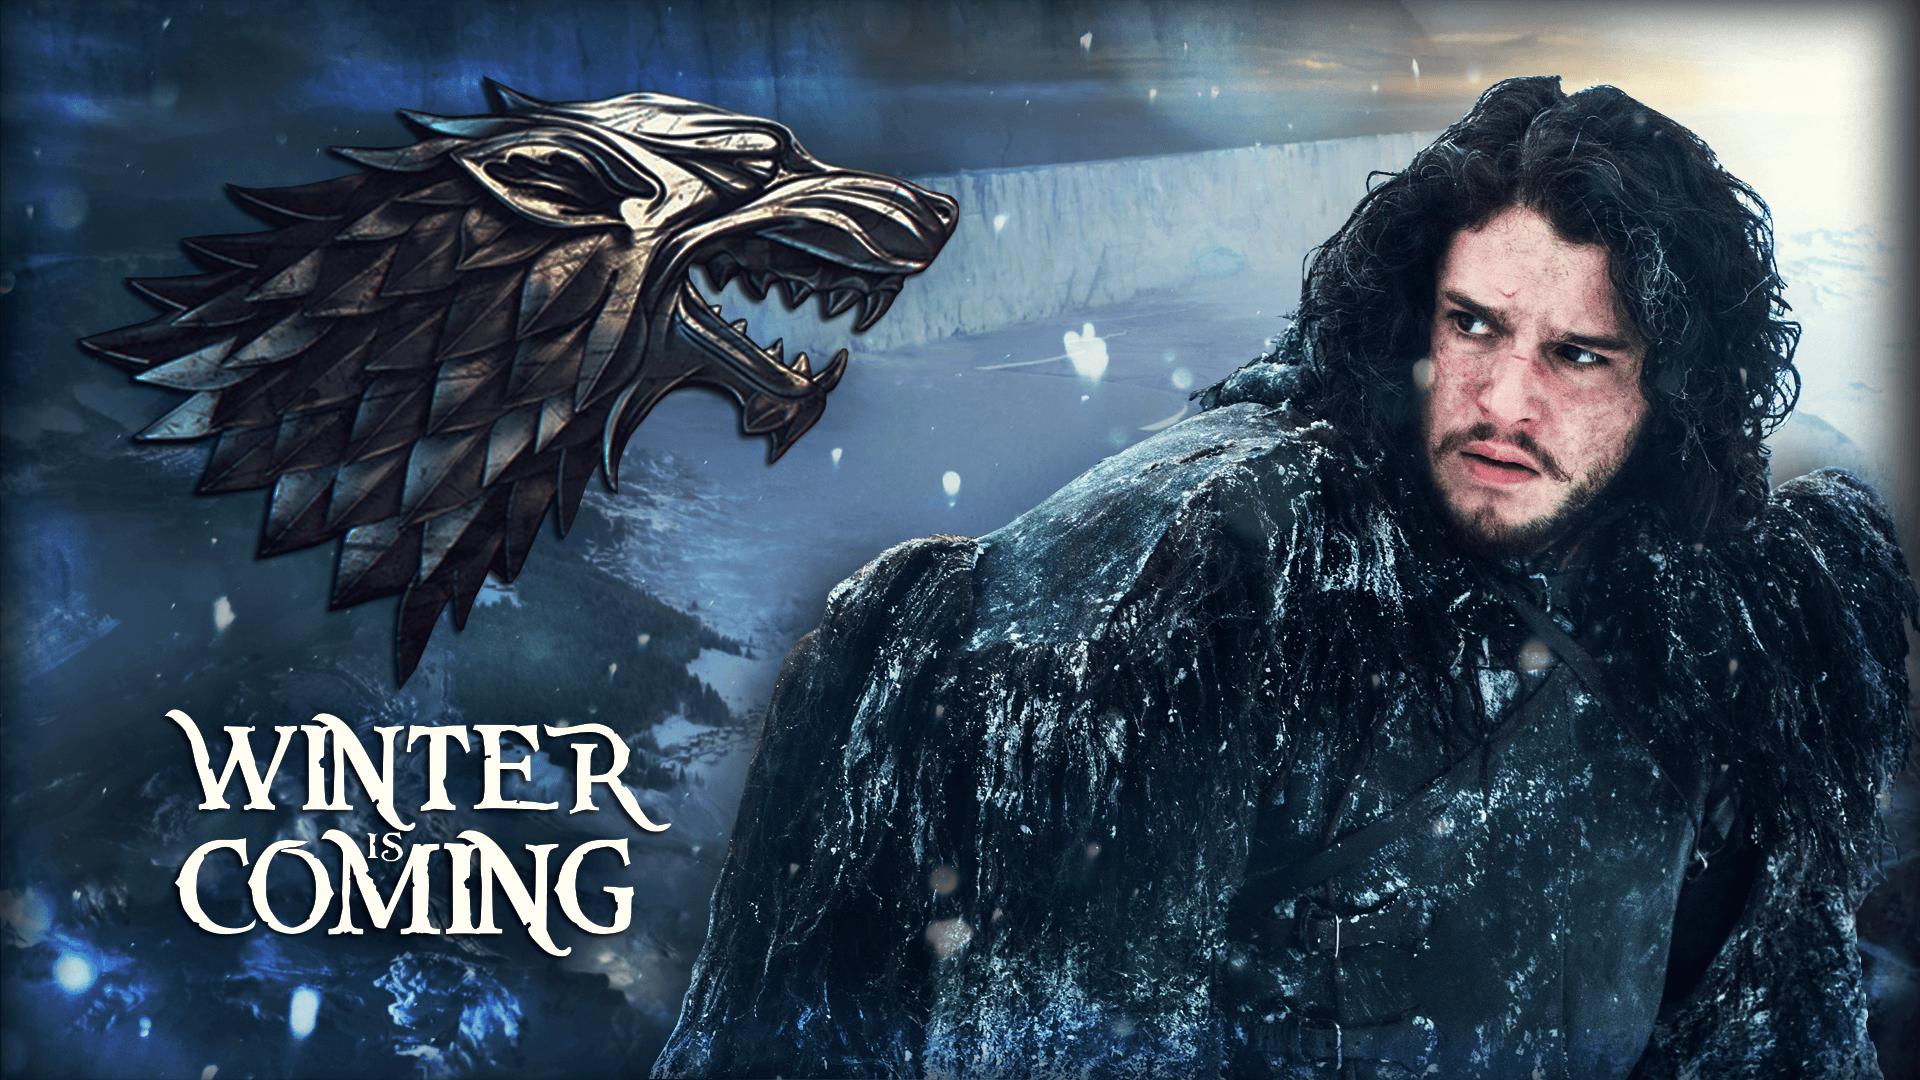 Jon Snow Game Of Thrones Wallpapers - Wallpaper Cave